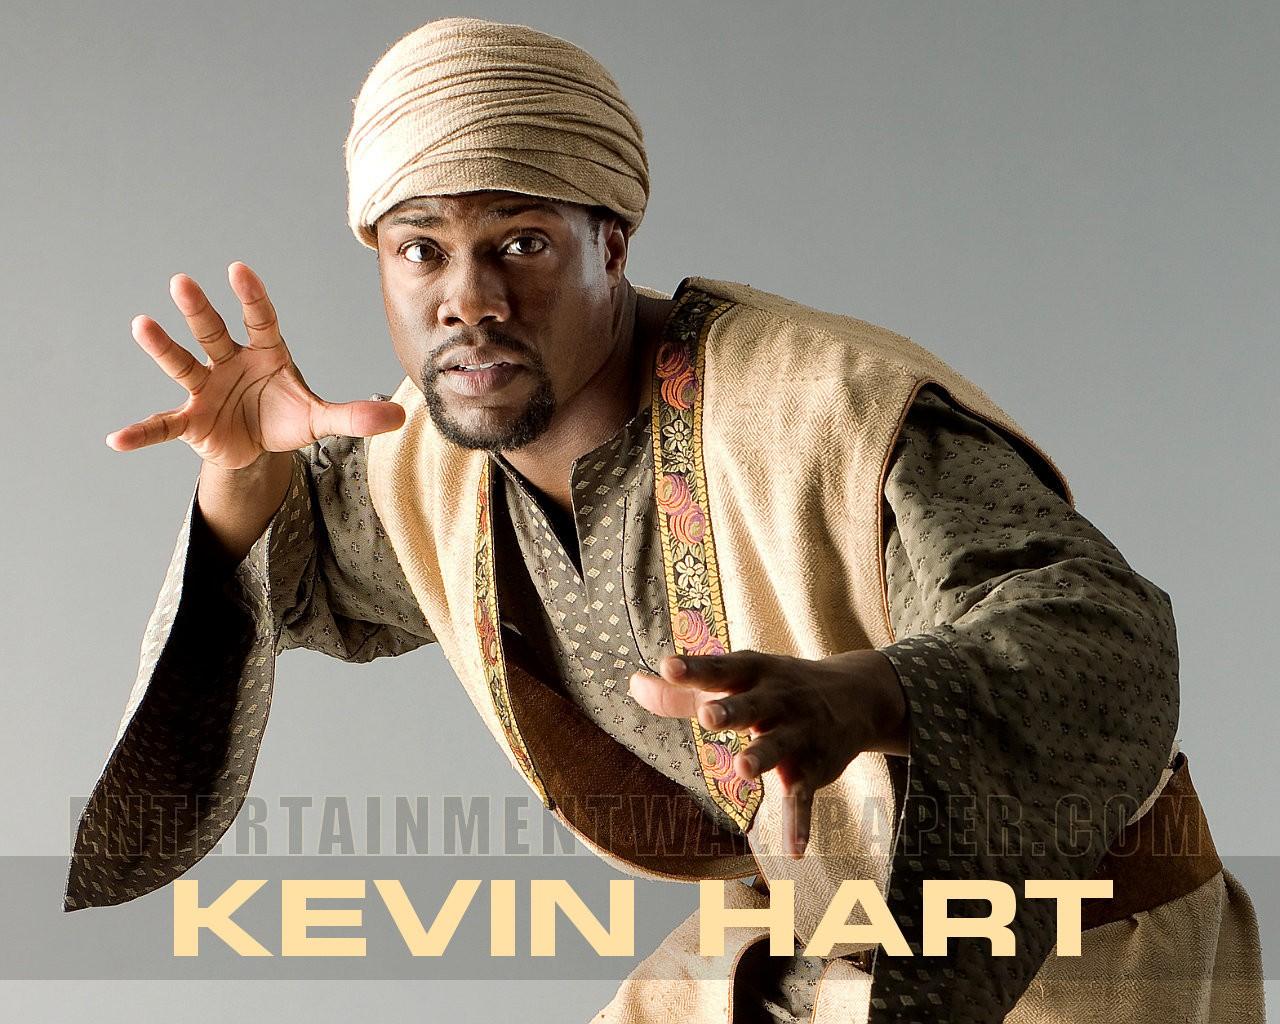 48] Kevin Hart Wallpapers on WallpaperSafari 1280x1024